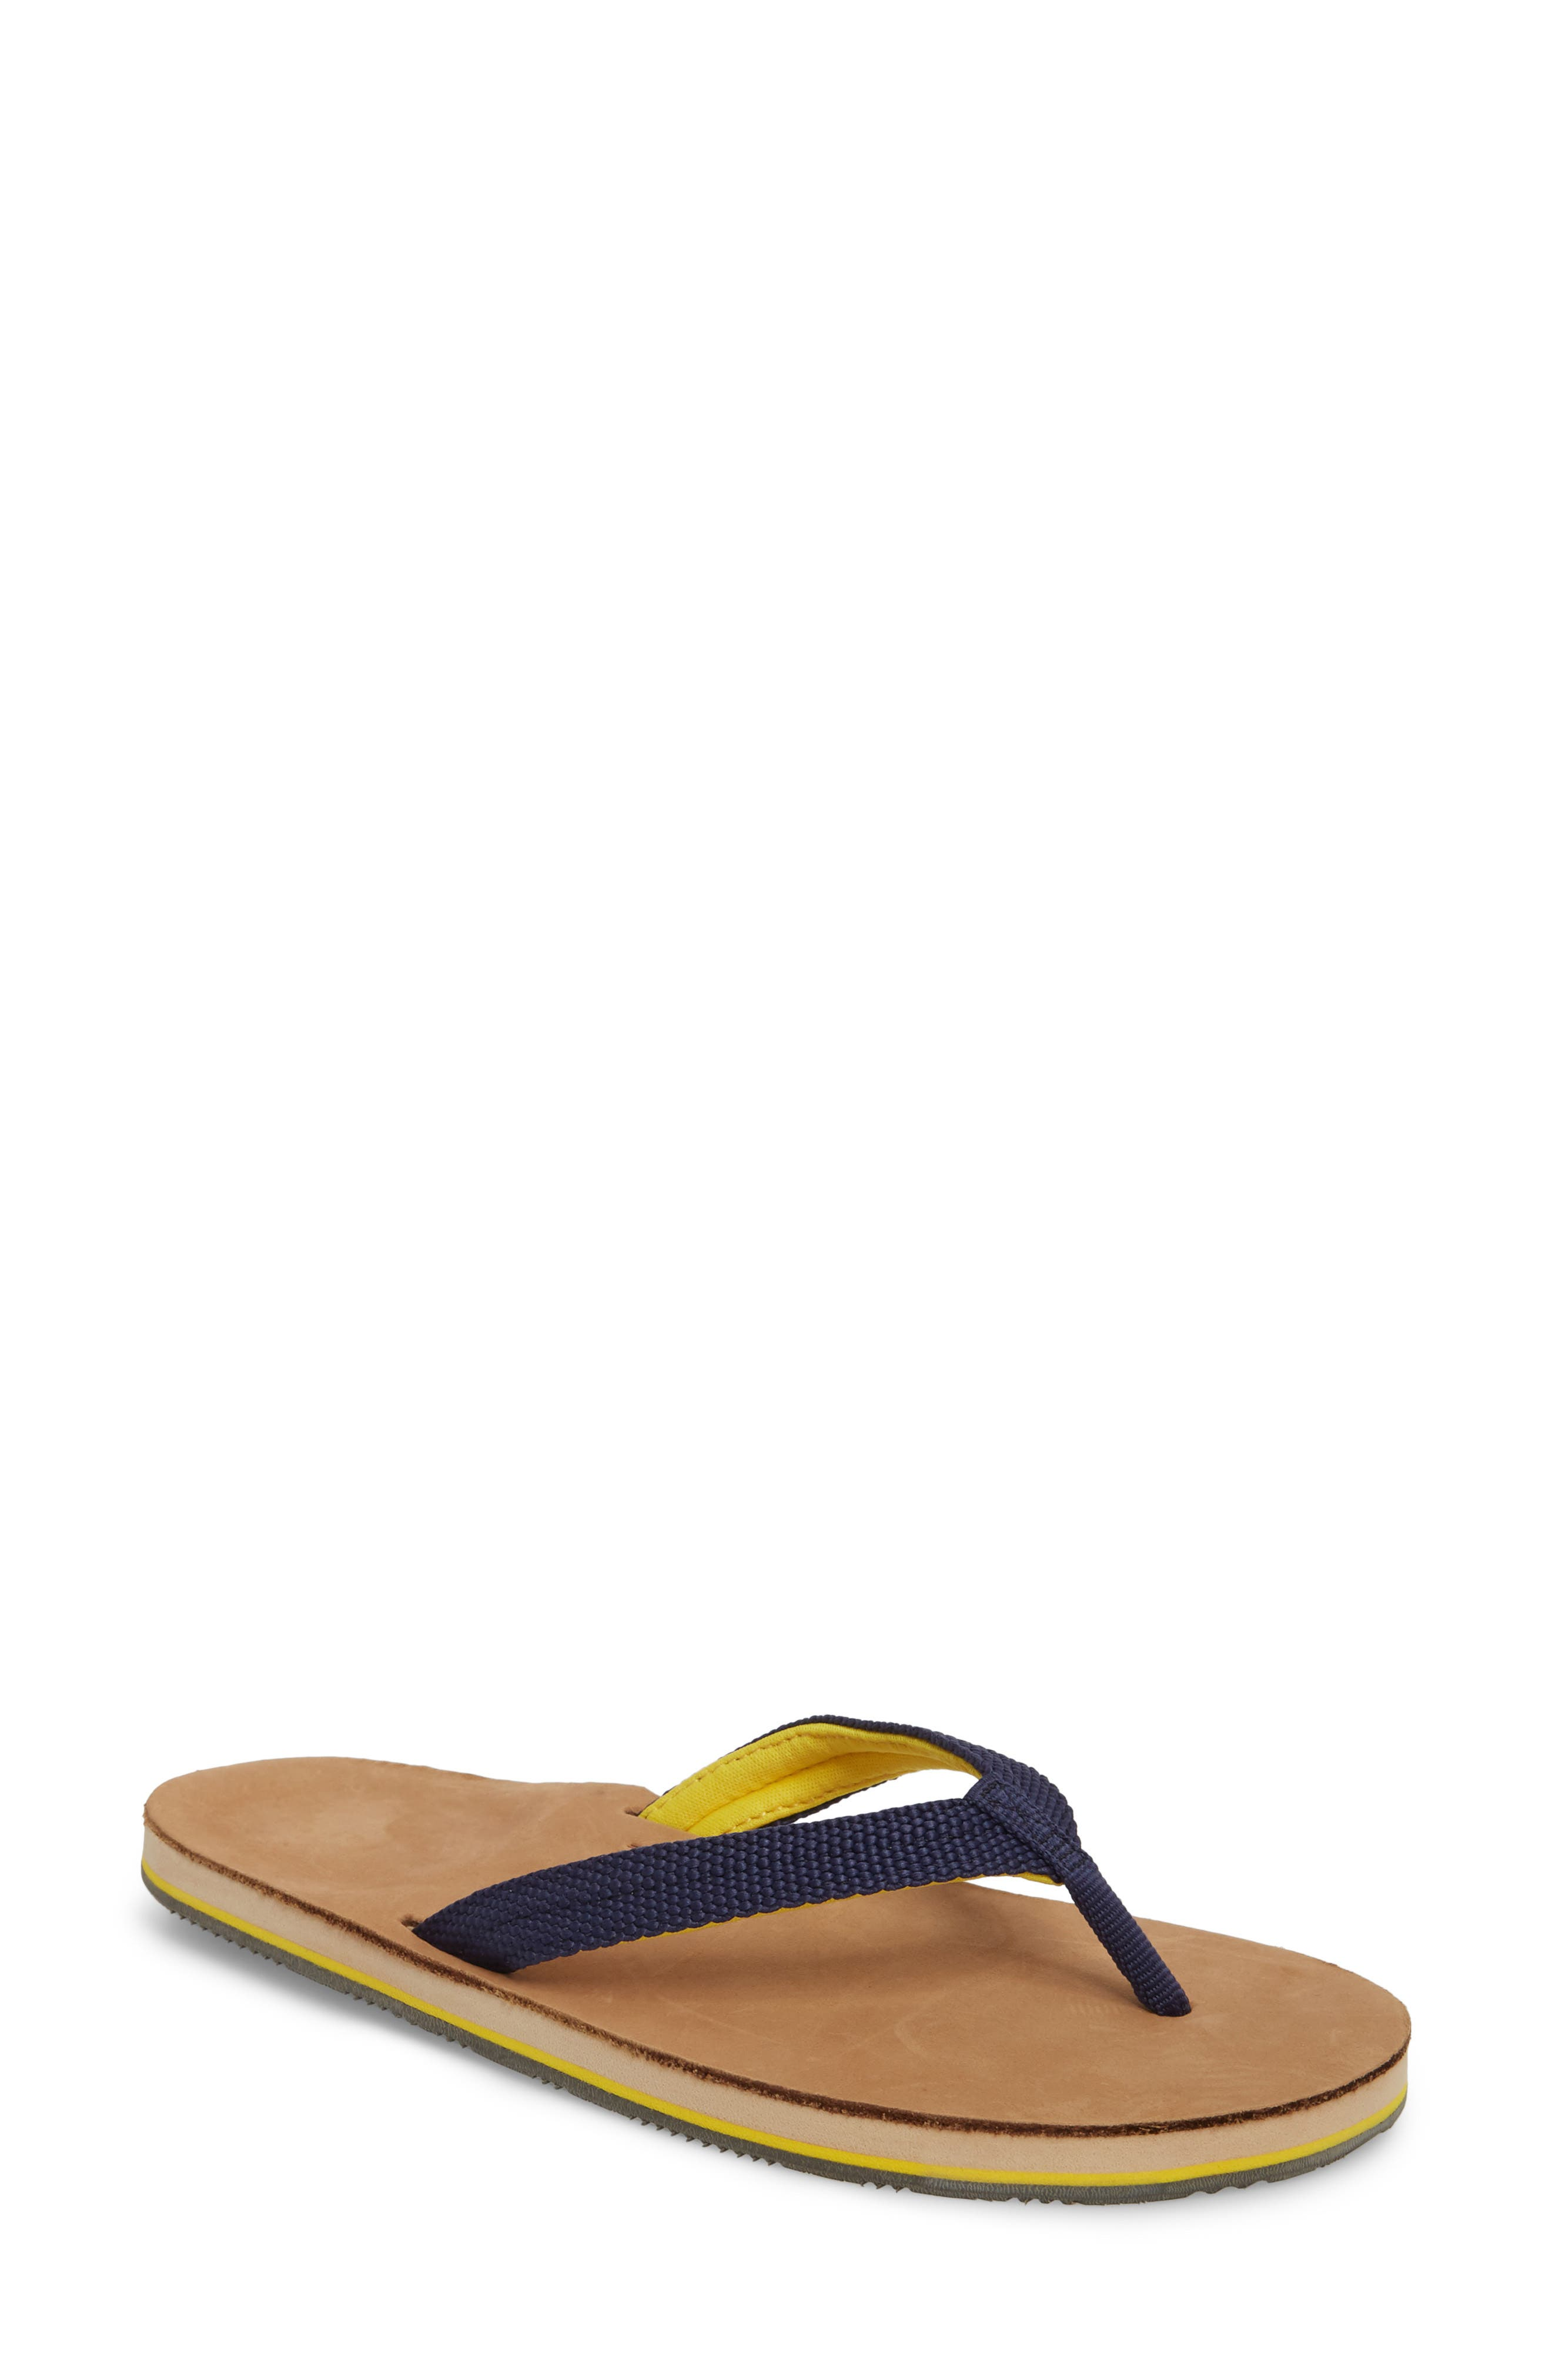 Scouts Flip Flop,                             Main thumbnail 1, color,                             Navy Yellow